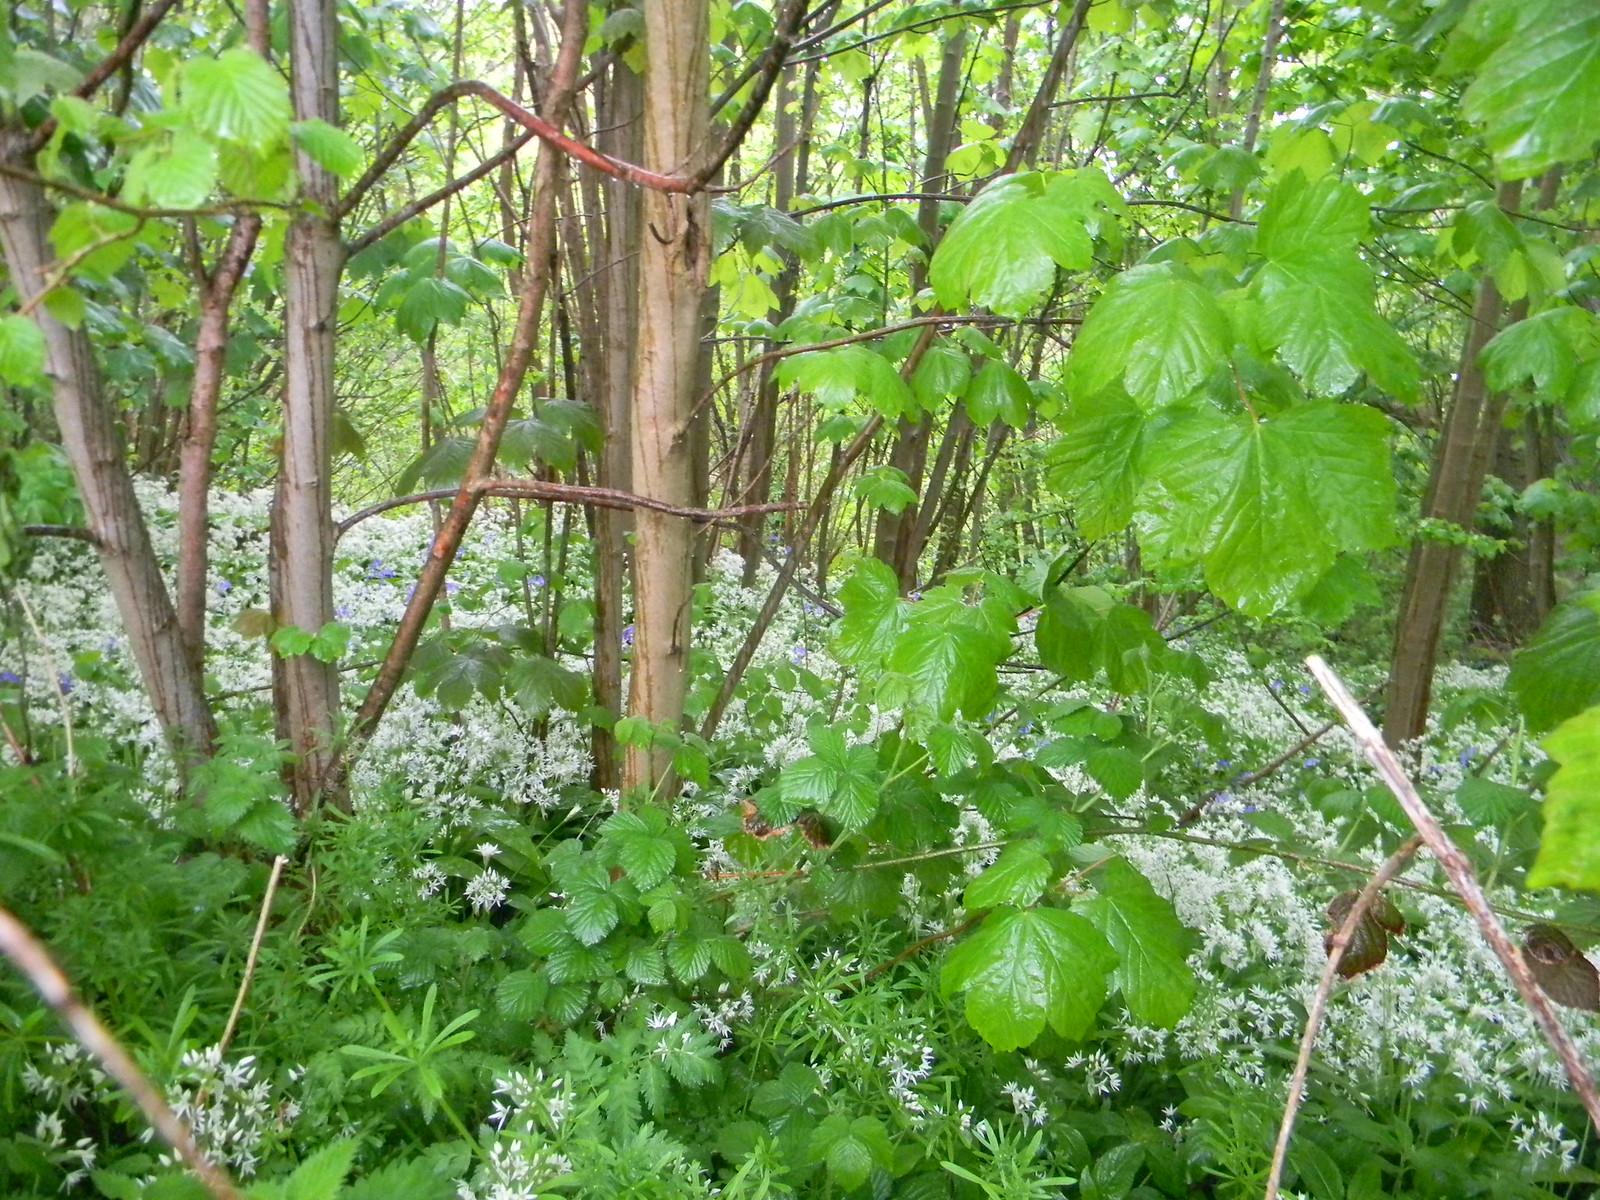 Wild garlic Borough Green to Sevenoaks (composite walk)